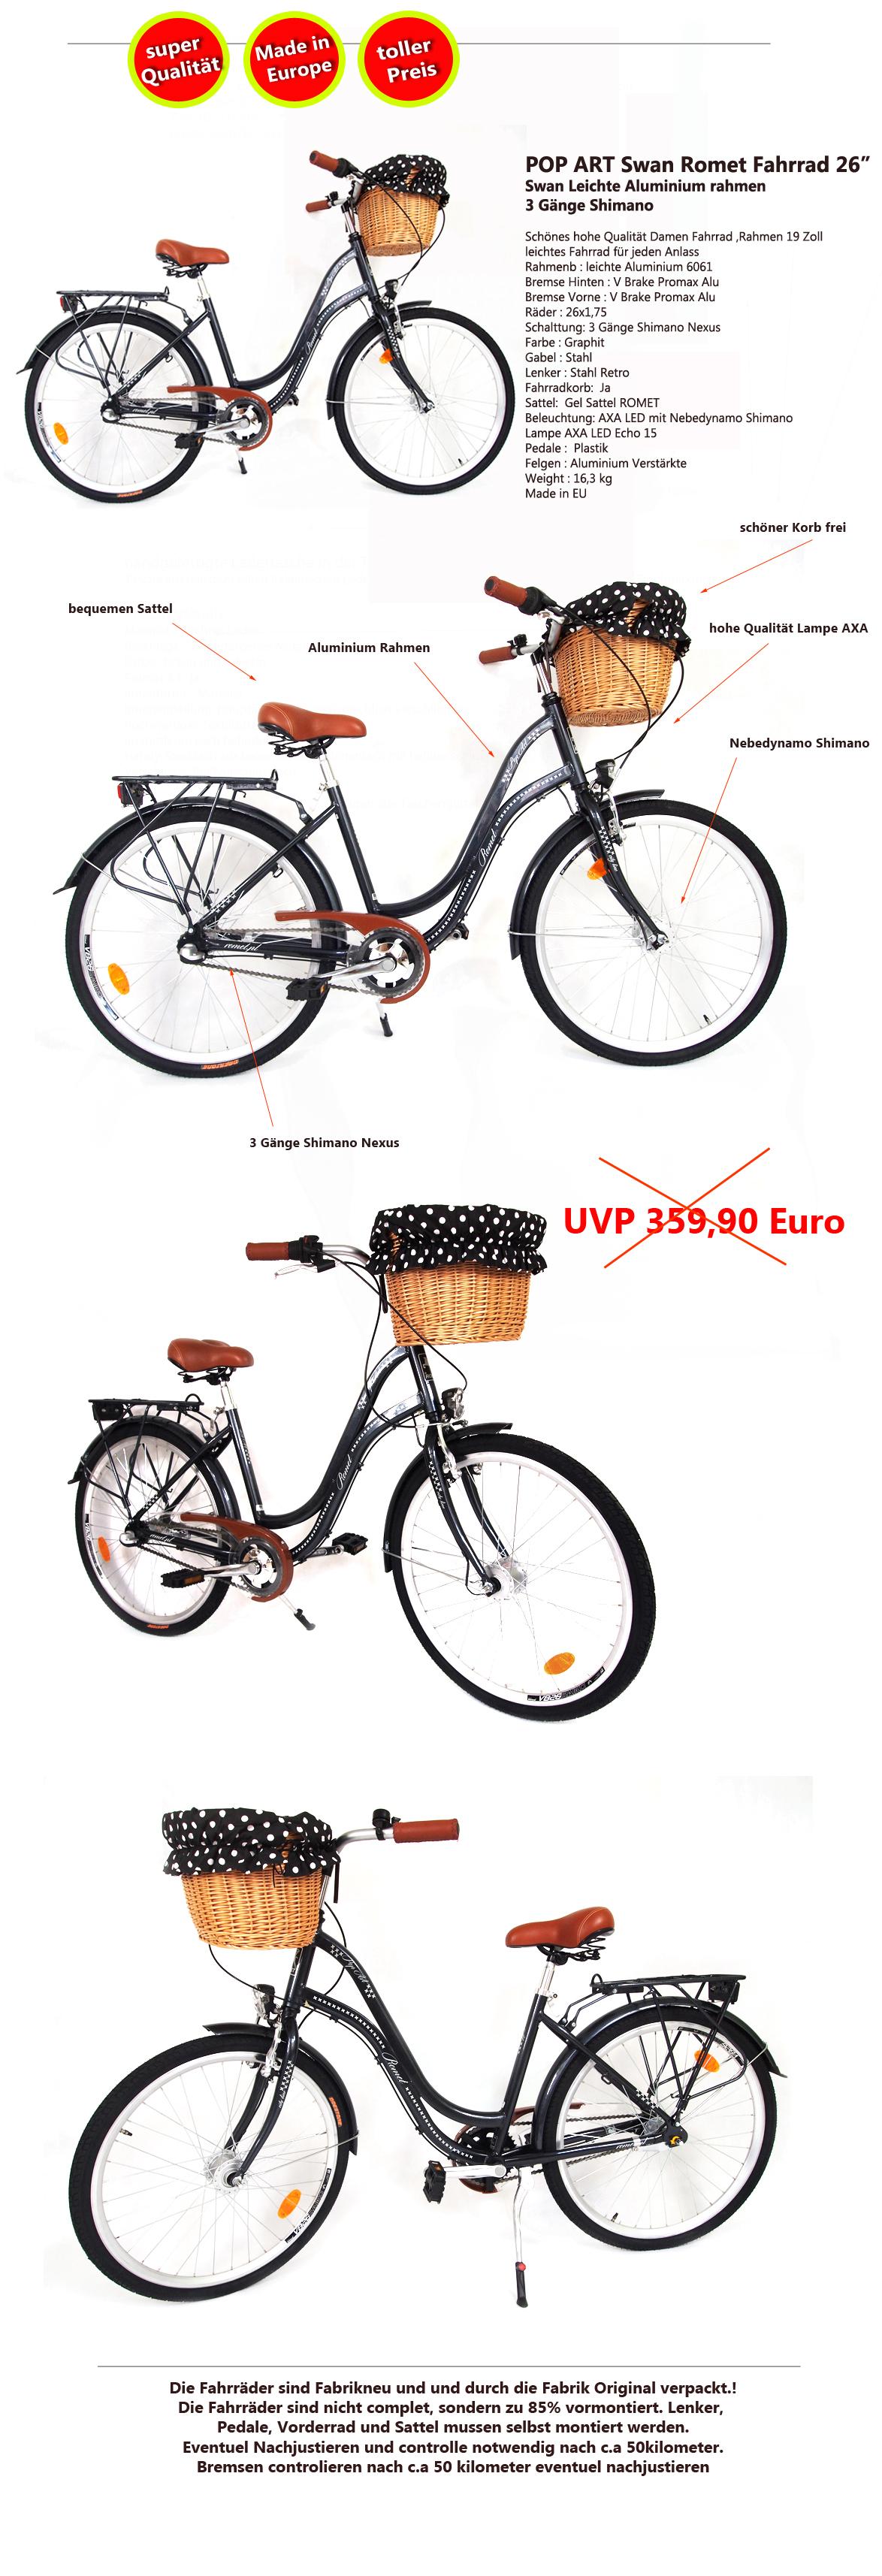 Damen Fahrrad kaufen auf ricardo.ch